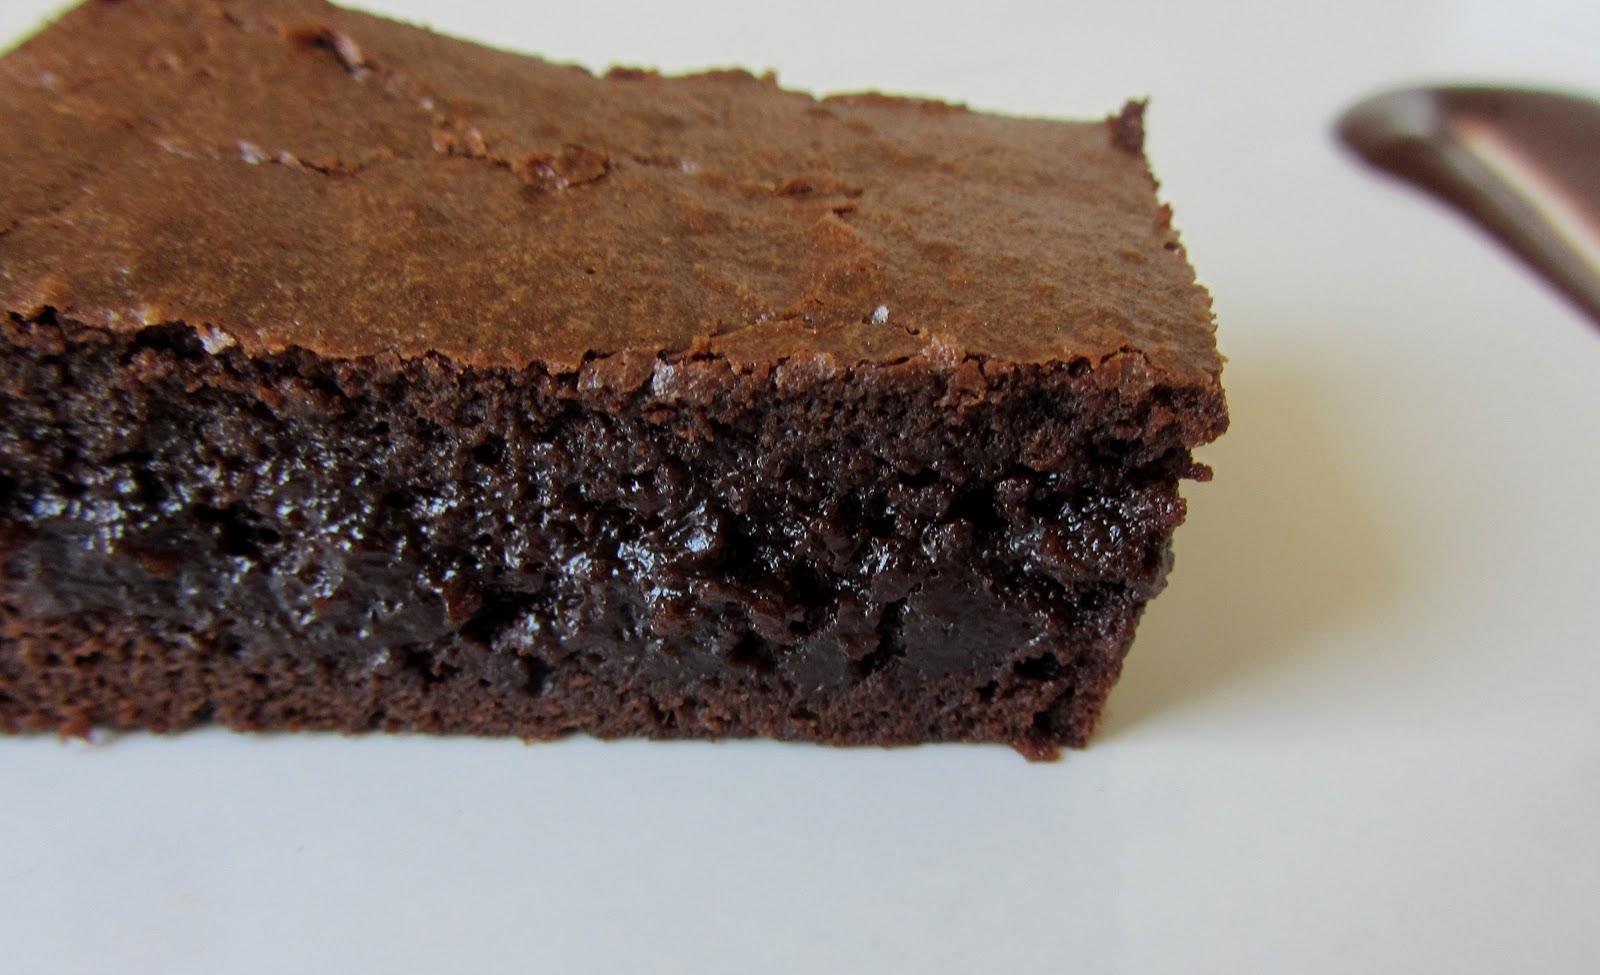 imagesGateau-chocolat-18.jpg